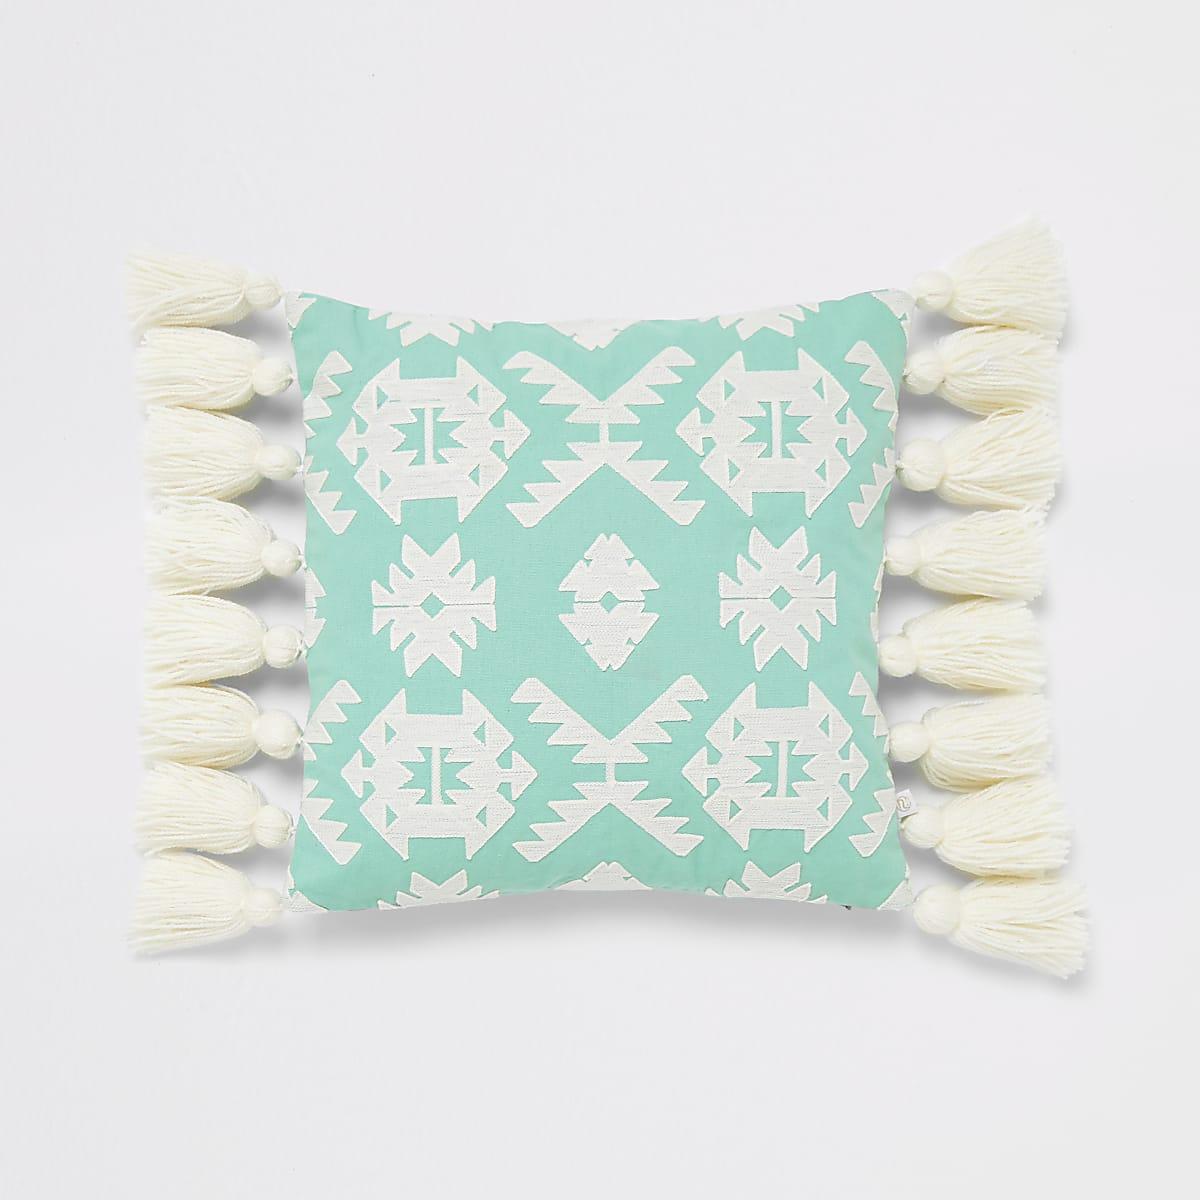 Green geo embroidery tassel cushion